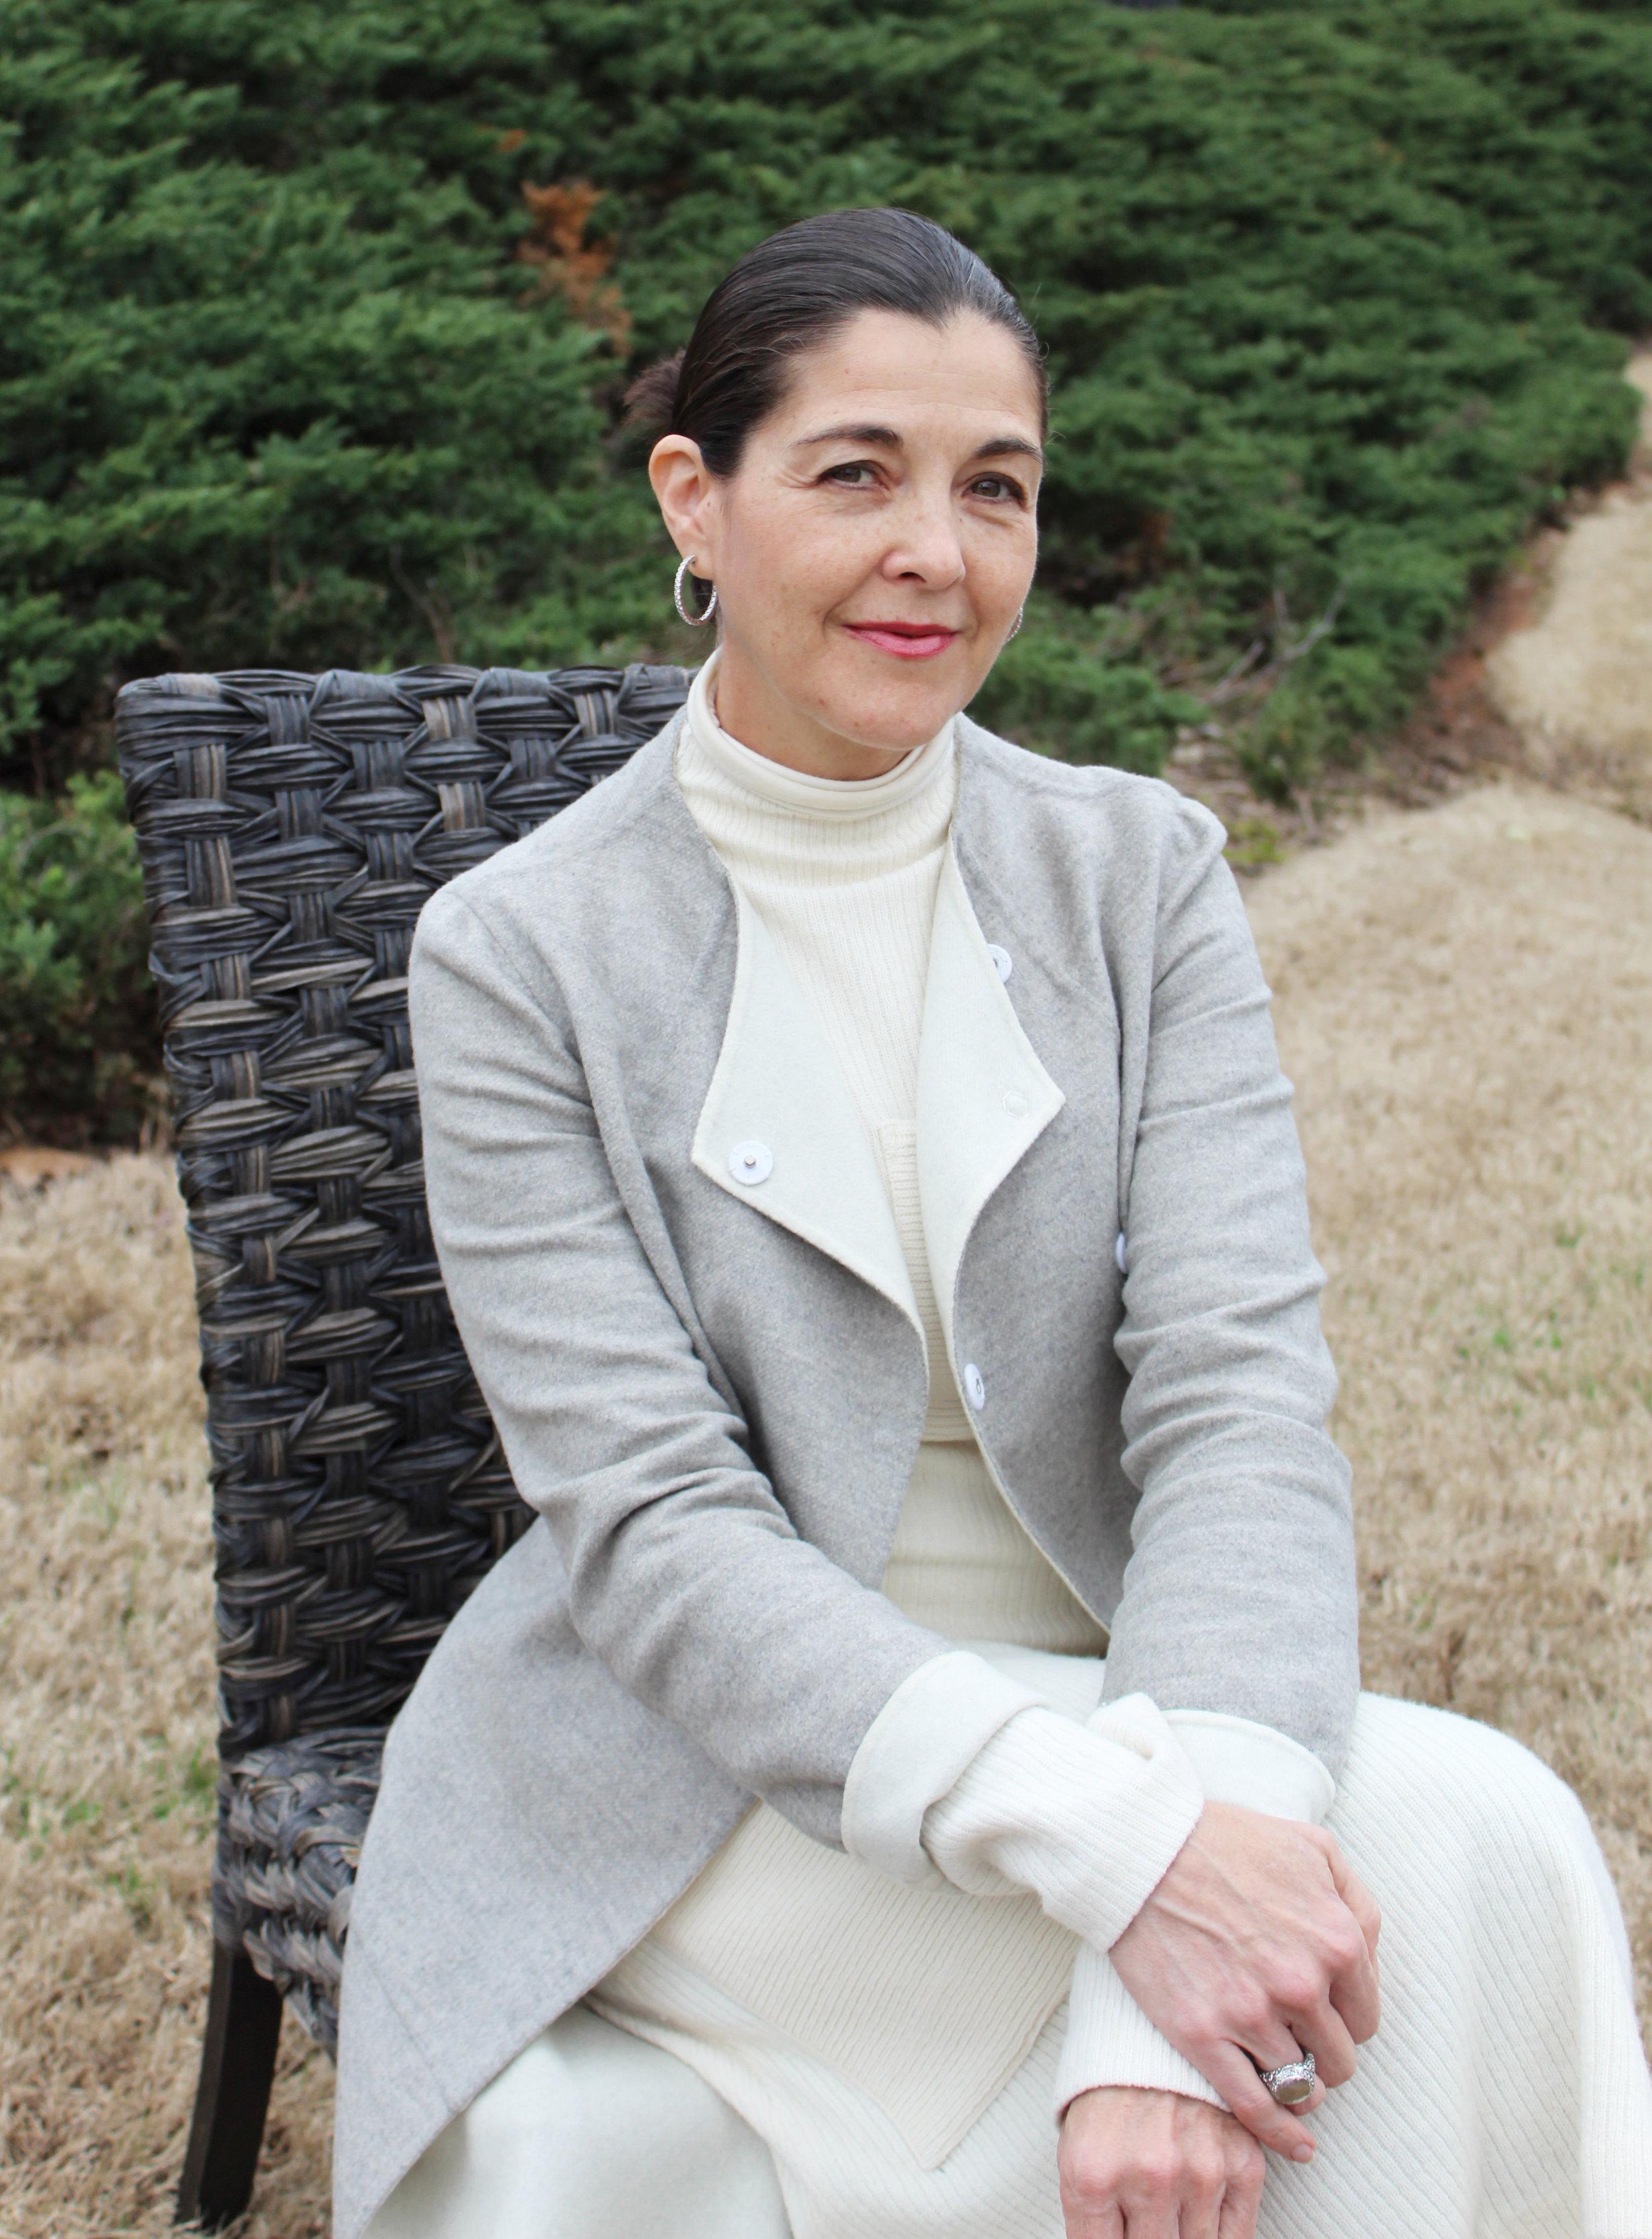 Barbara Phillips, Director of Academics